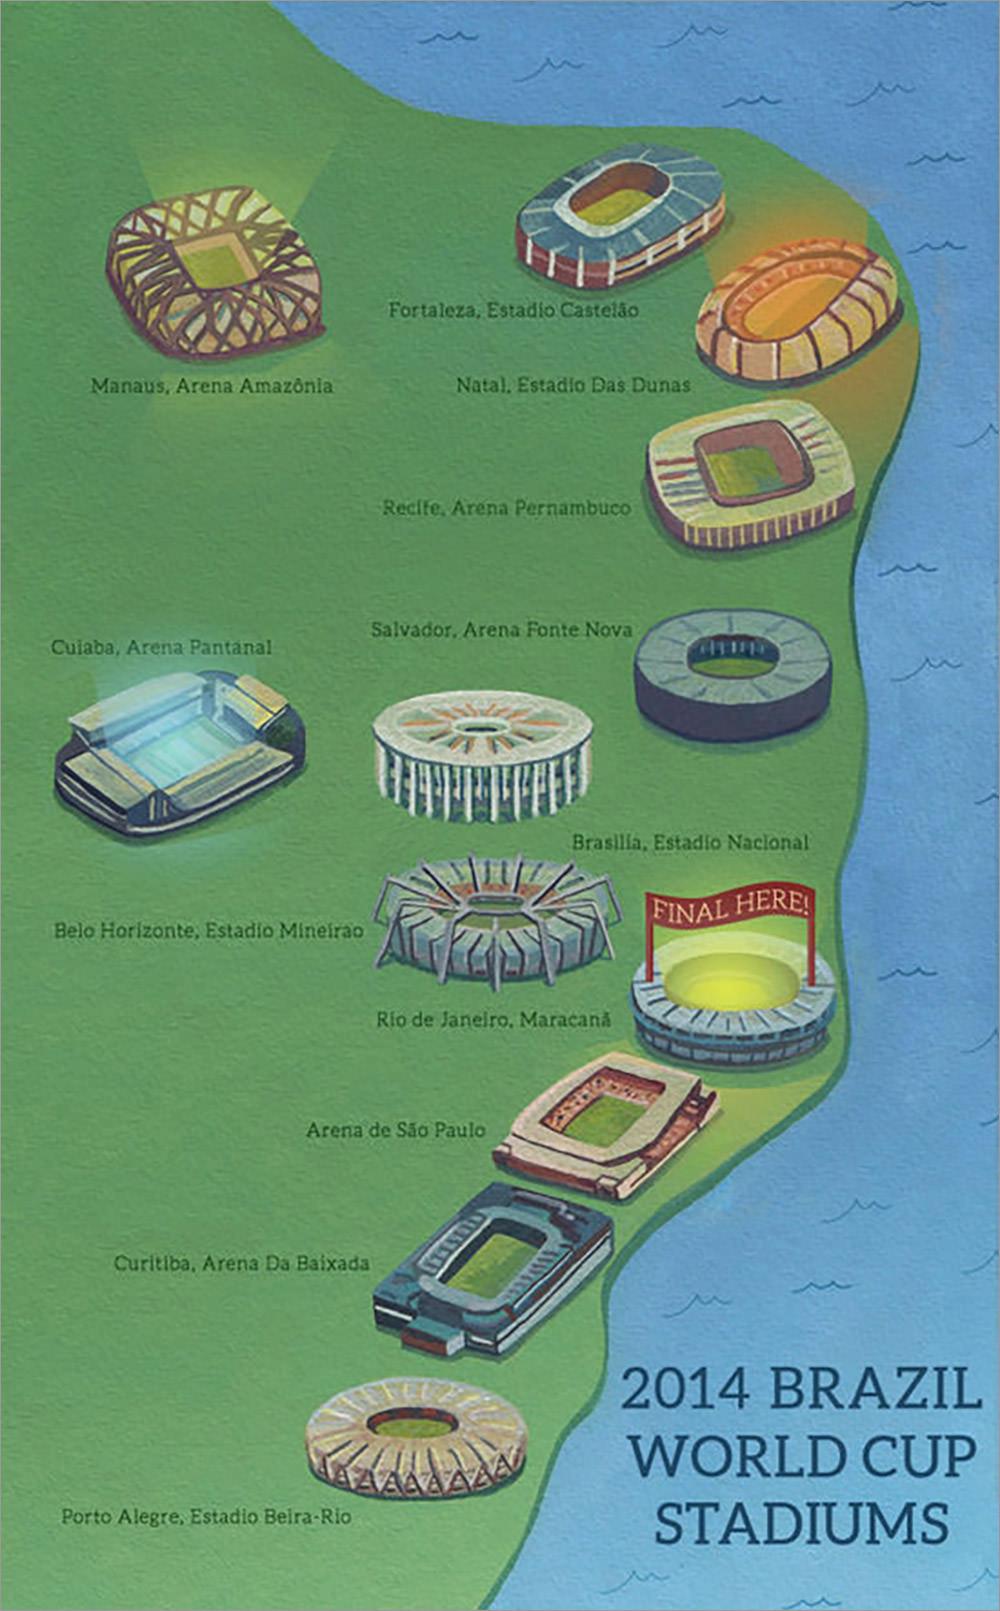 Brazil World Cup 2014 Stadium Ilustrated Map